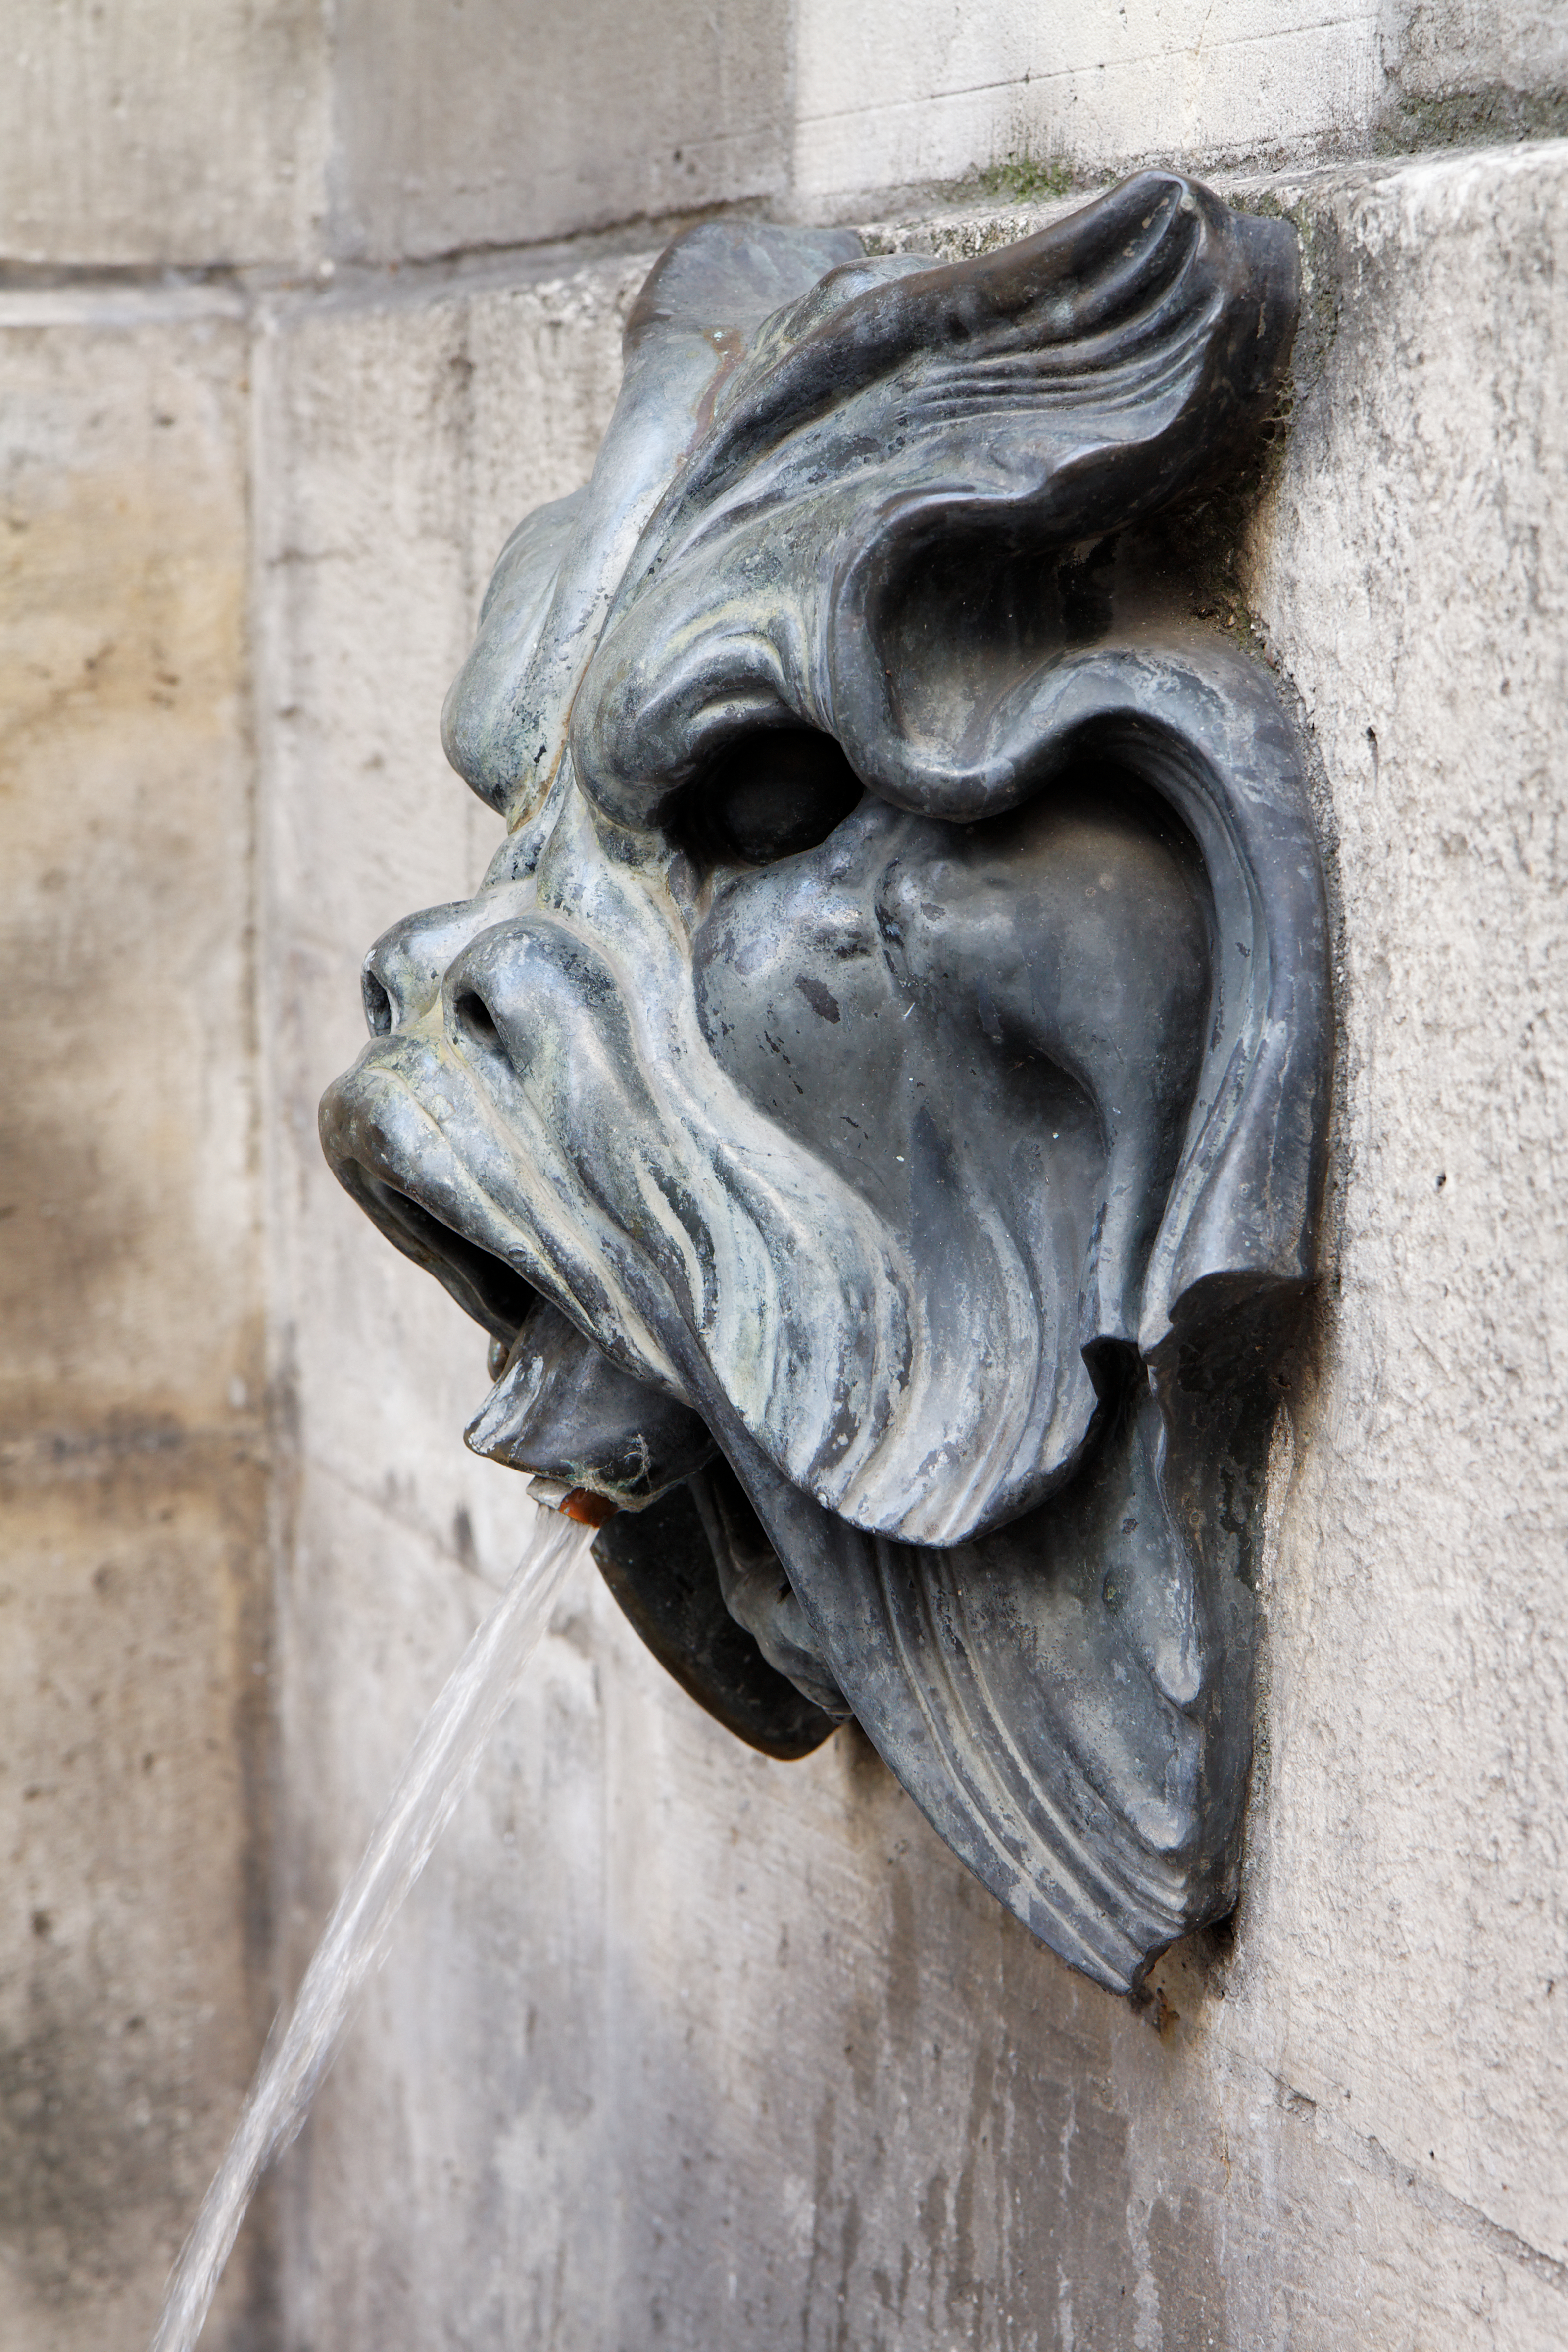 https://upload.wikimedia.org/wikipedia/commons/e/e0/Paris_-_Fontaine_des_Quatre-Saisons_-_59_rue_de_Grenelle_-_008.jpg